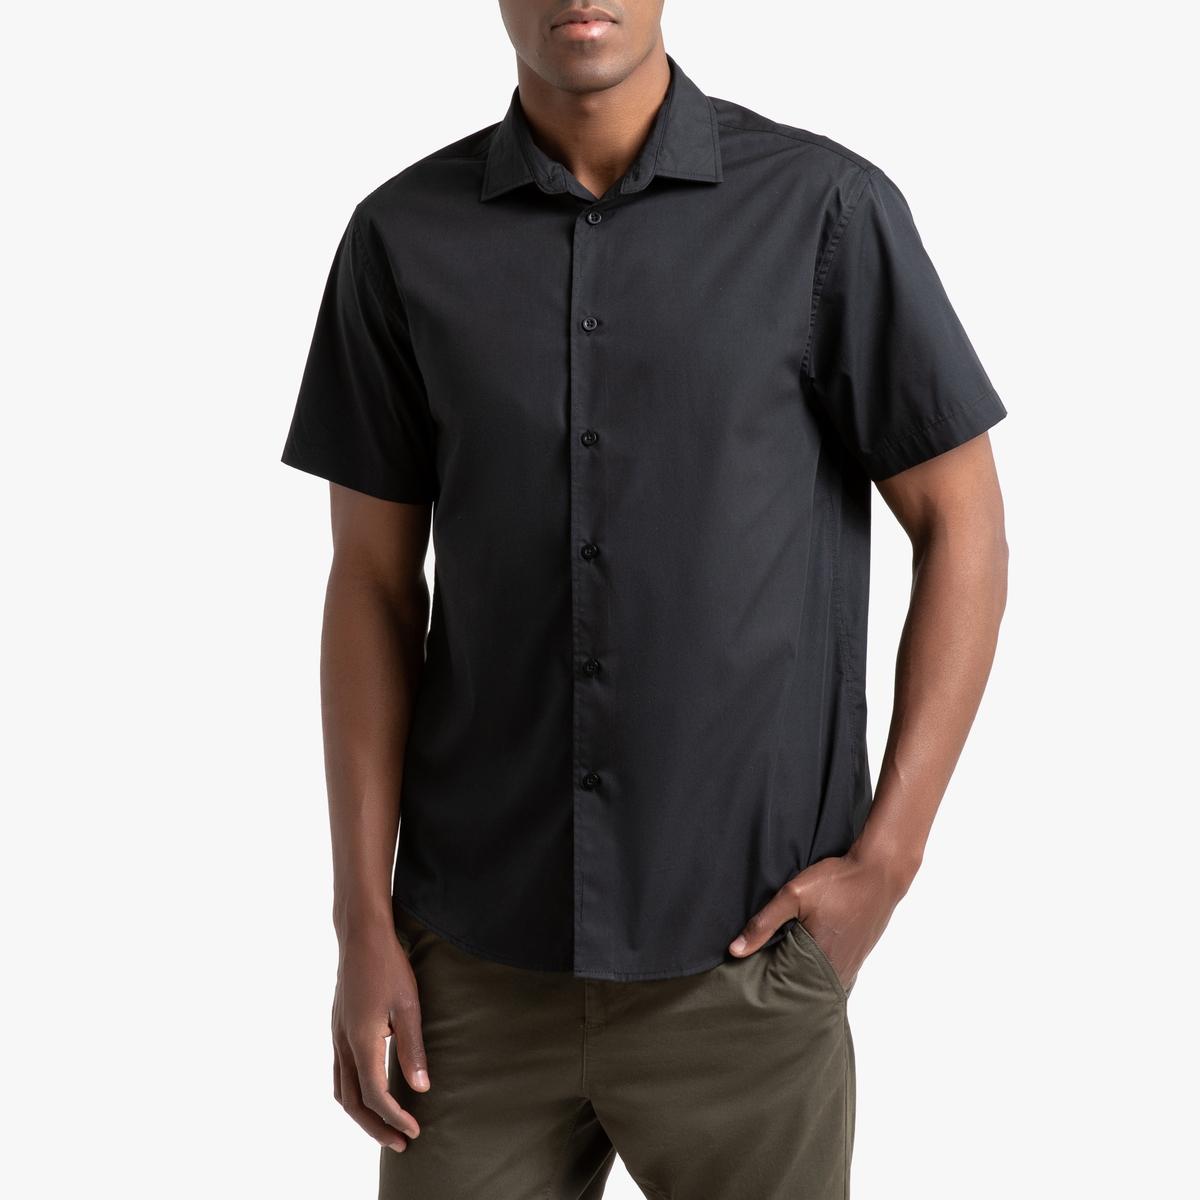 Фото - Рубашка LaRedoute Прямого покроя с короткими рукавами Christophe 37/38 черный юбка laredoute джинсовая прямого покроя xs синий